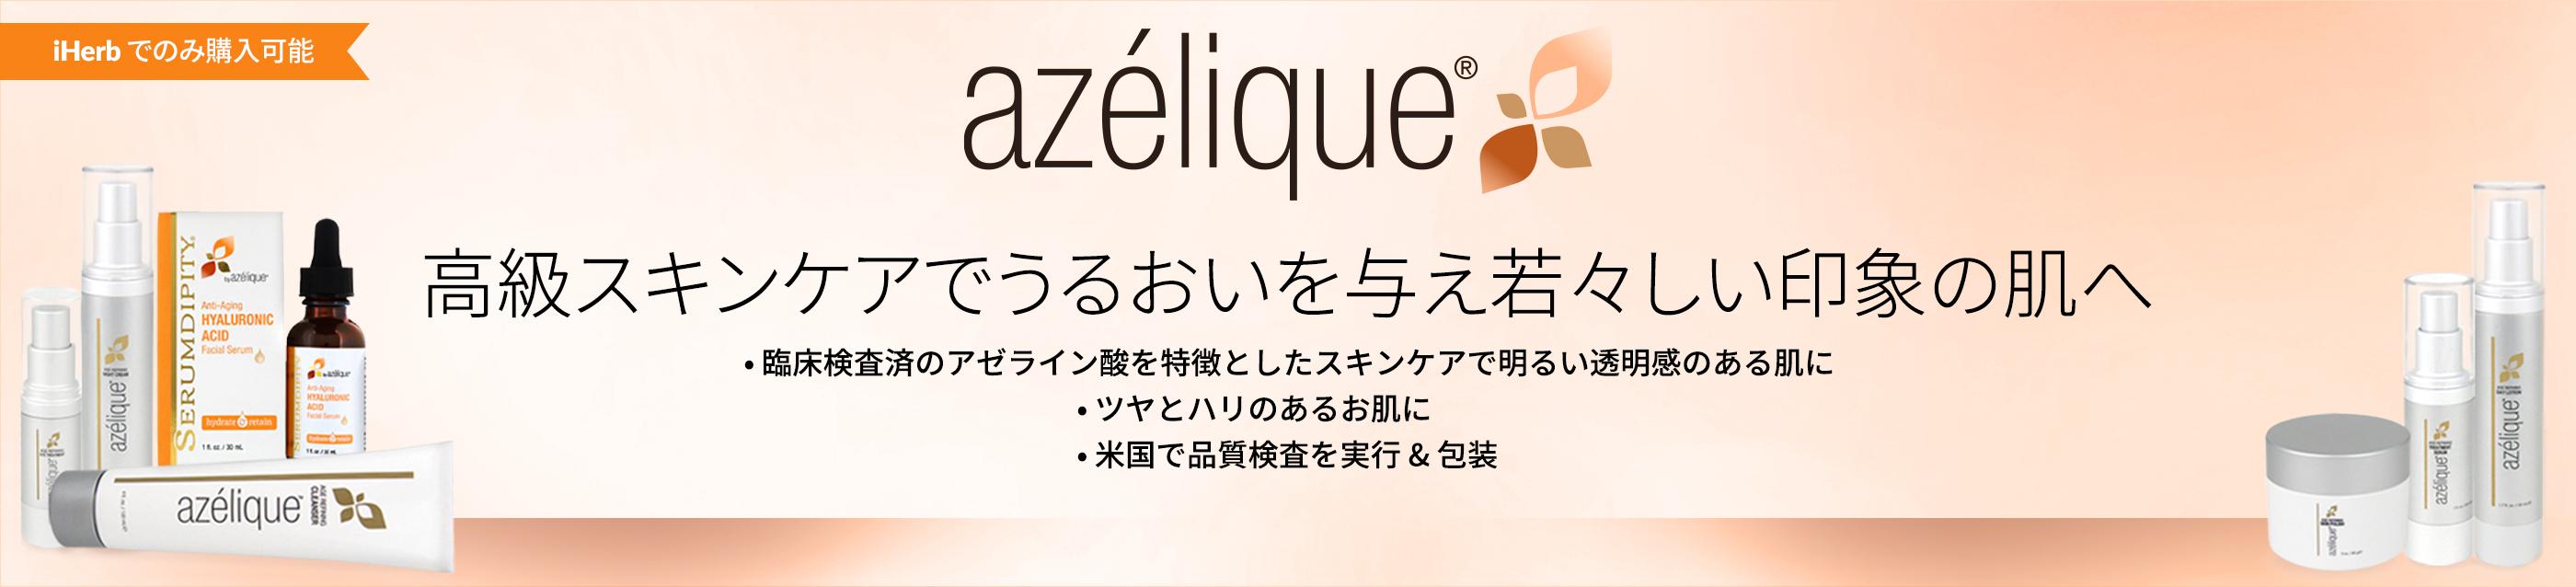 Azelique(アゼリーク)